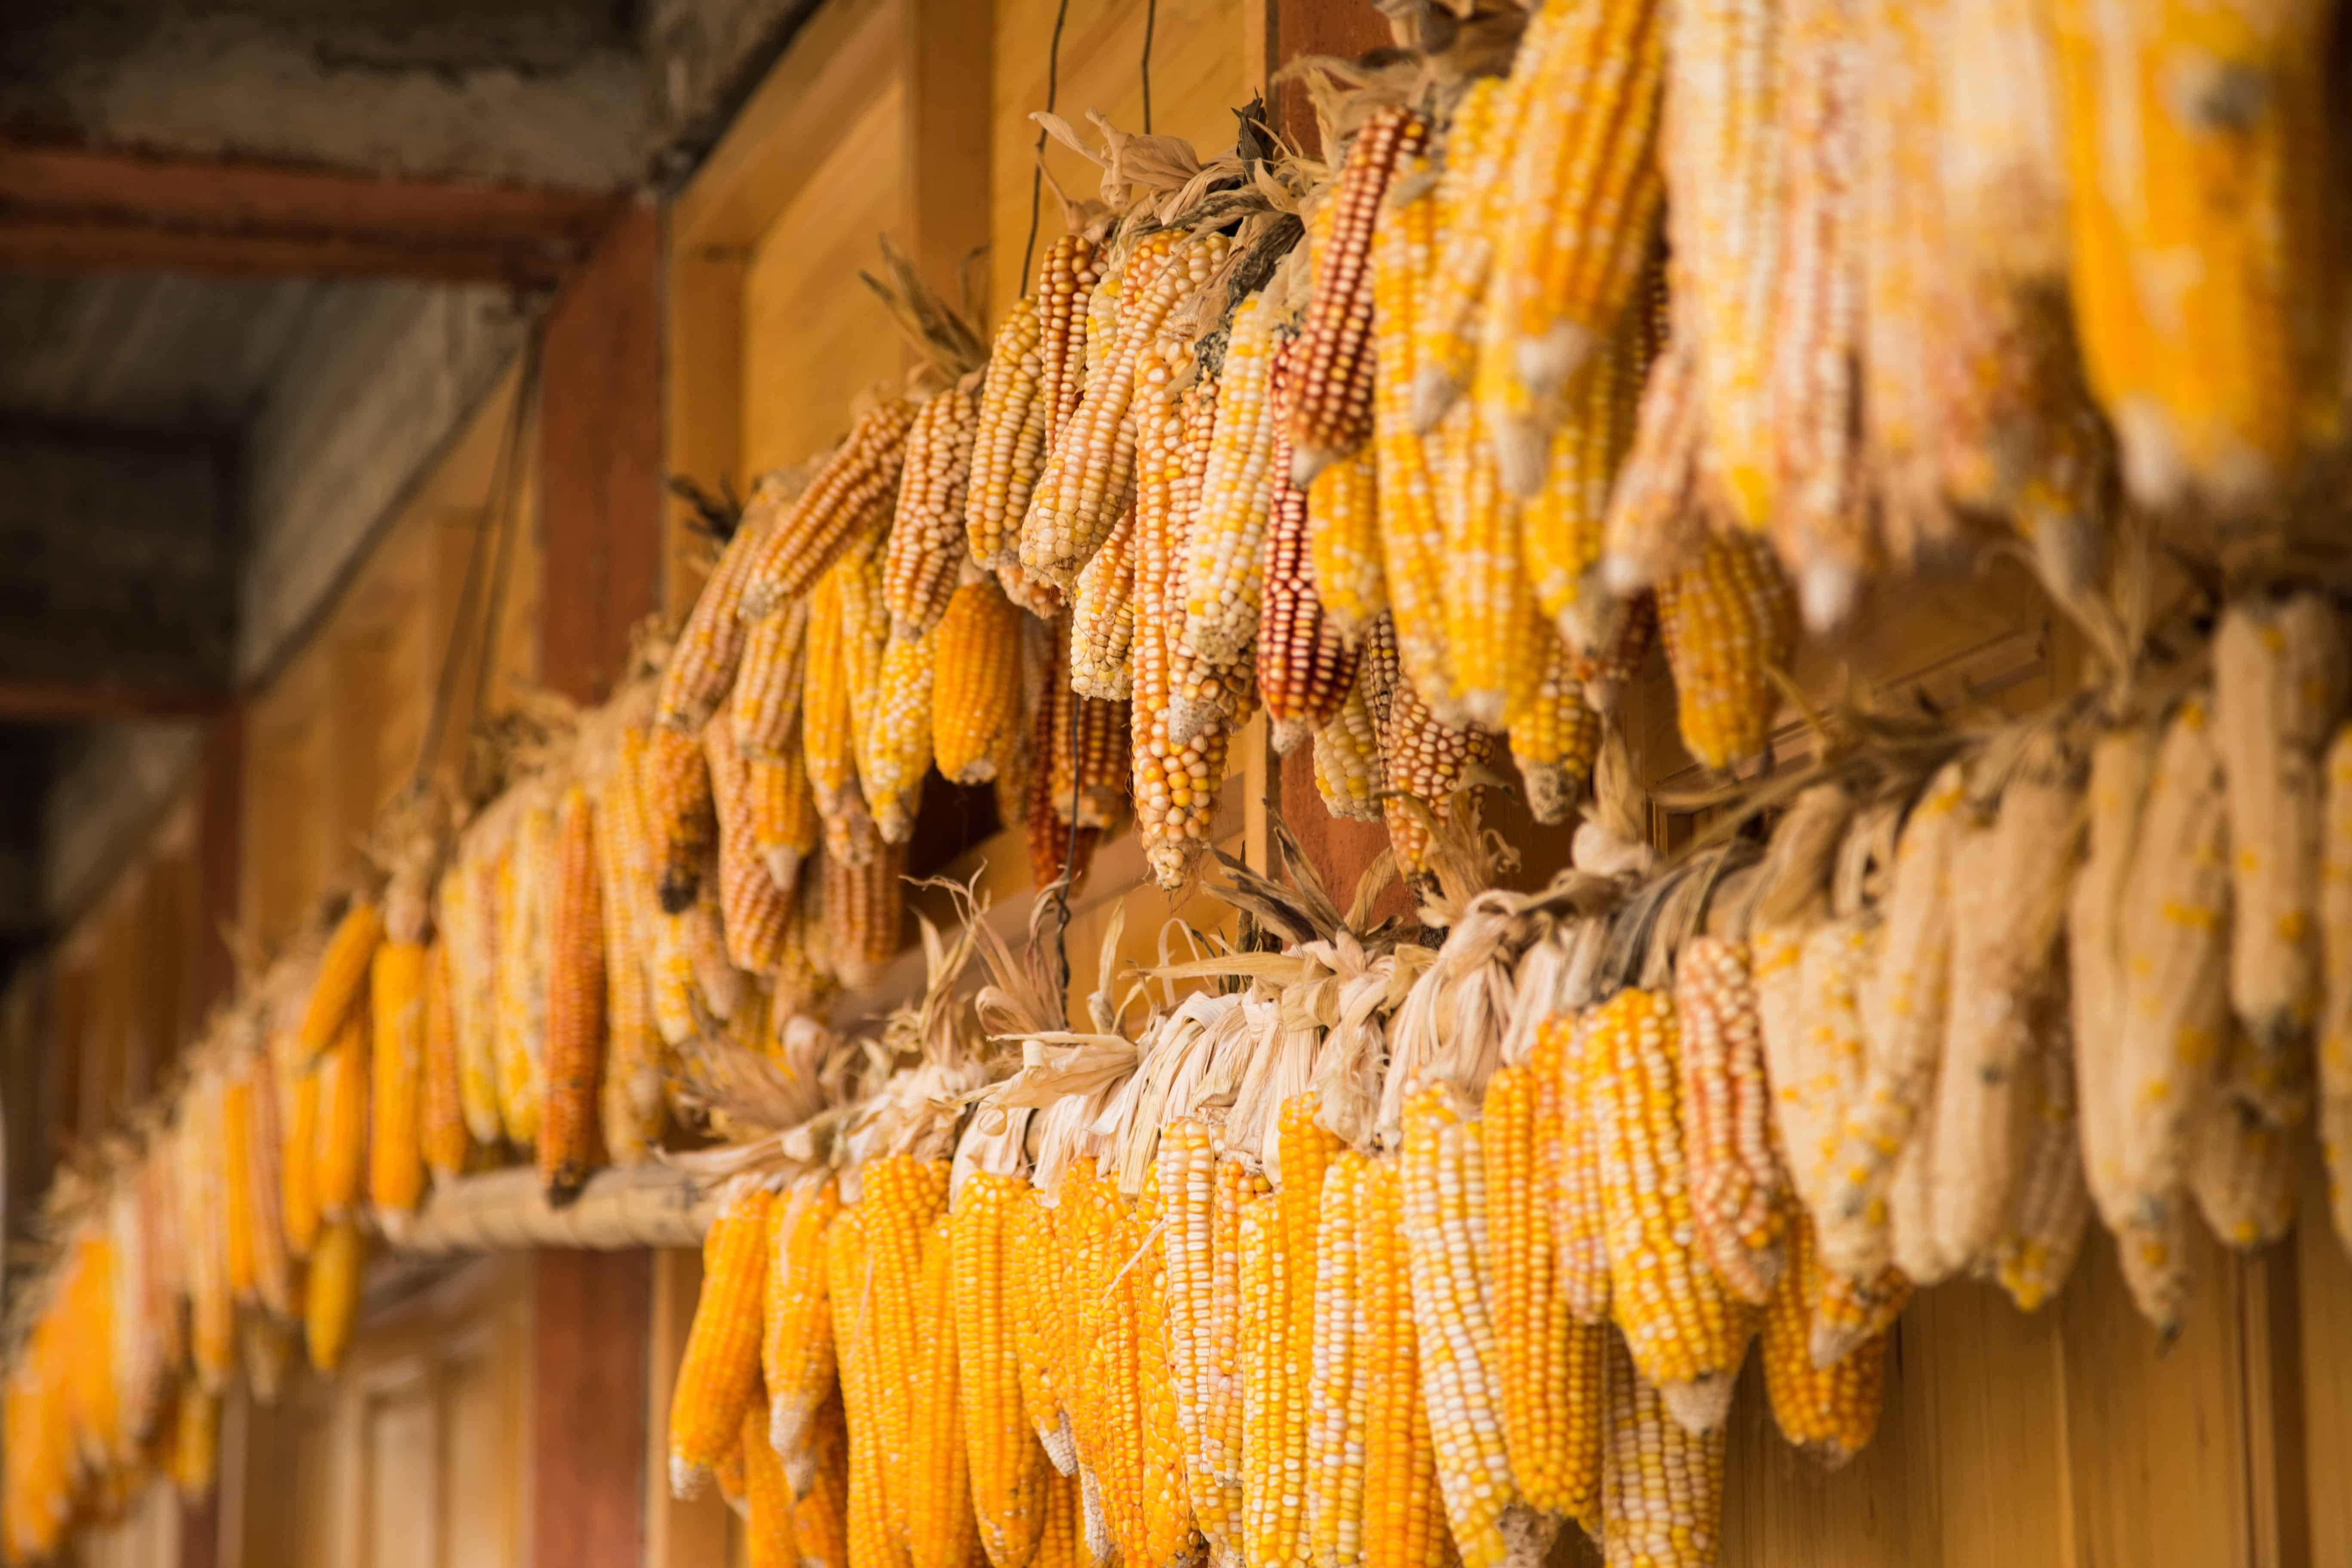 corn production, corn facts